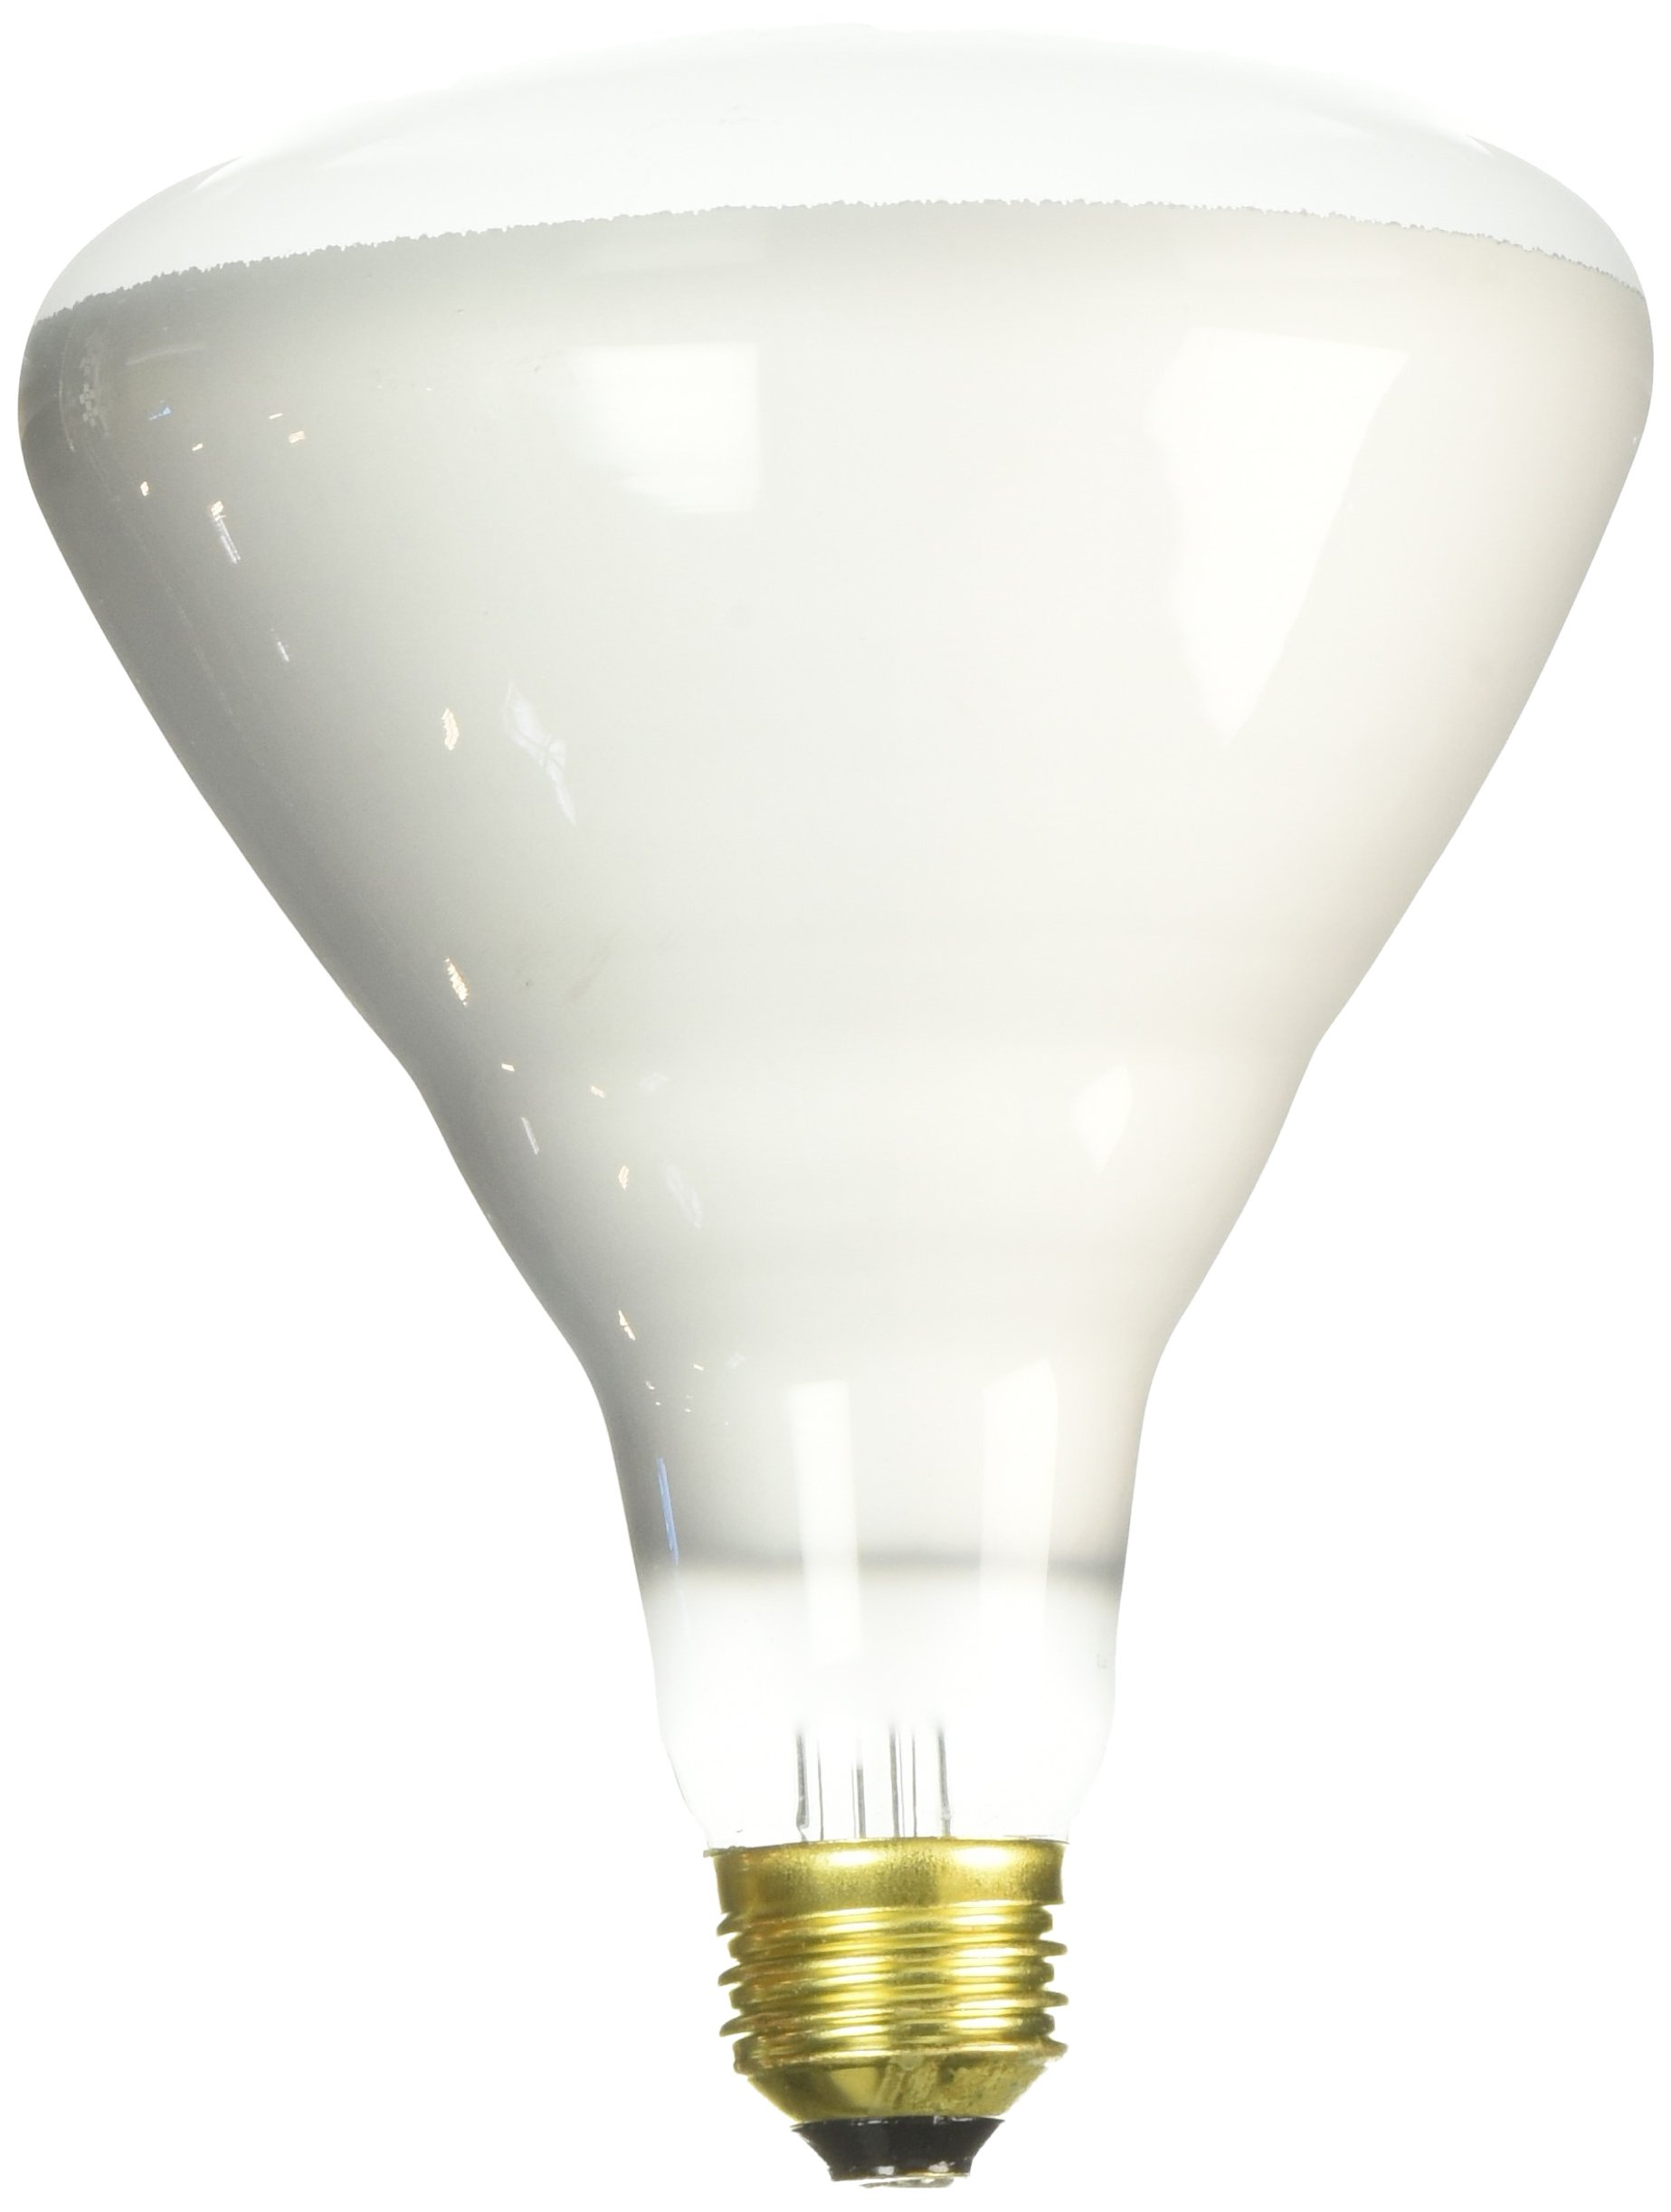 Sylvania Double Life Indoor 65 Watt Flood Light Bulb by Sylvania